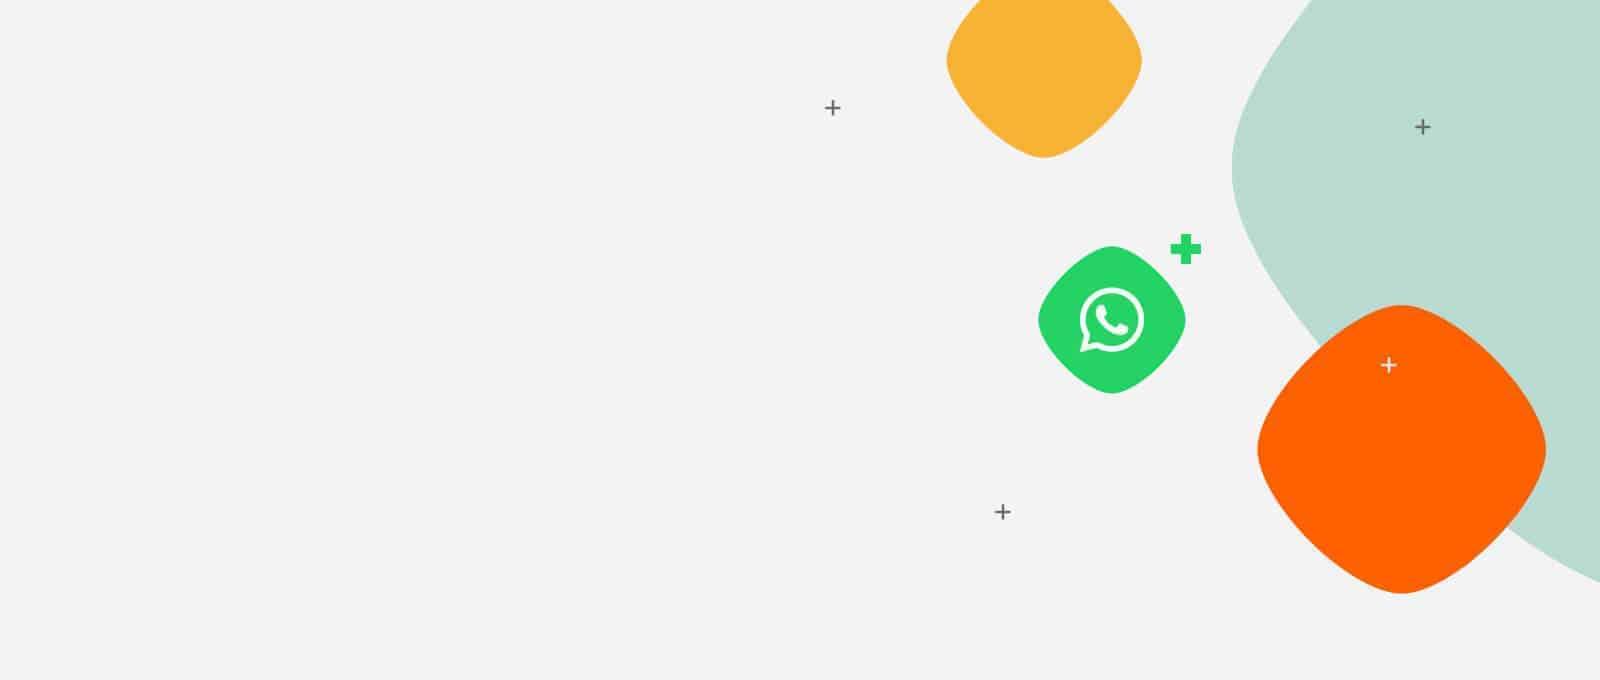 Como gerar novos contatos no WhatsApp